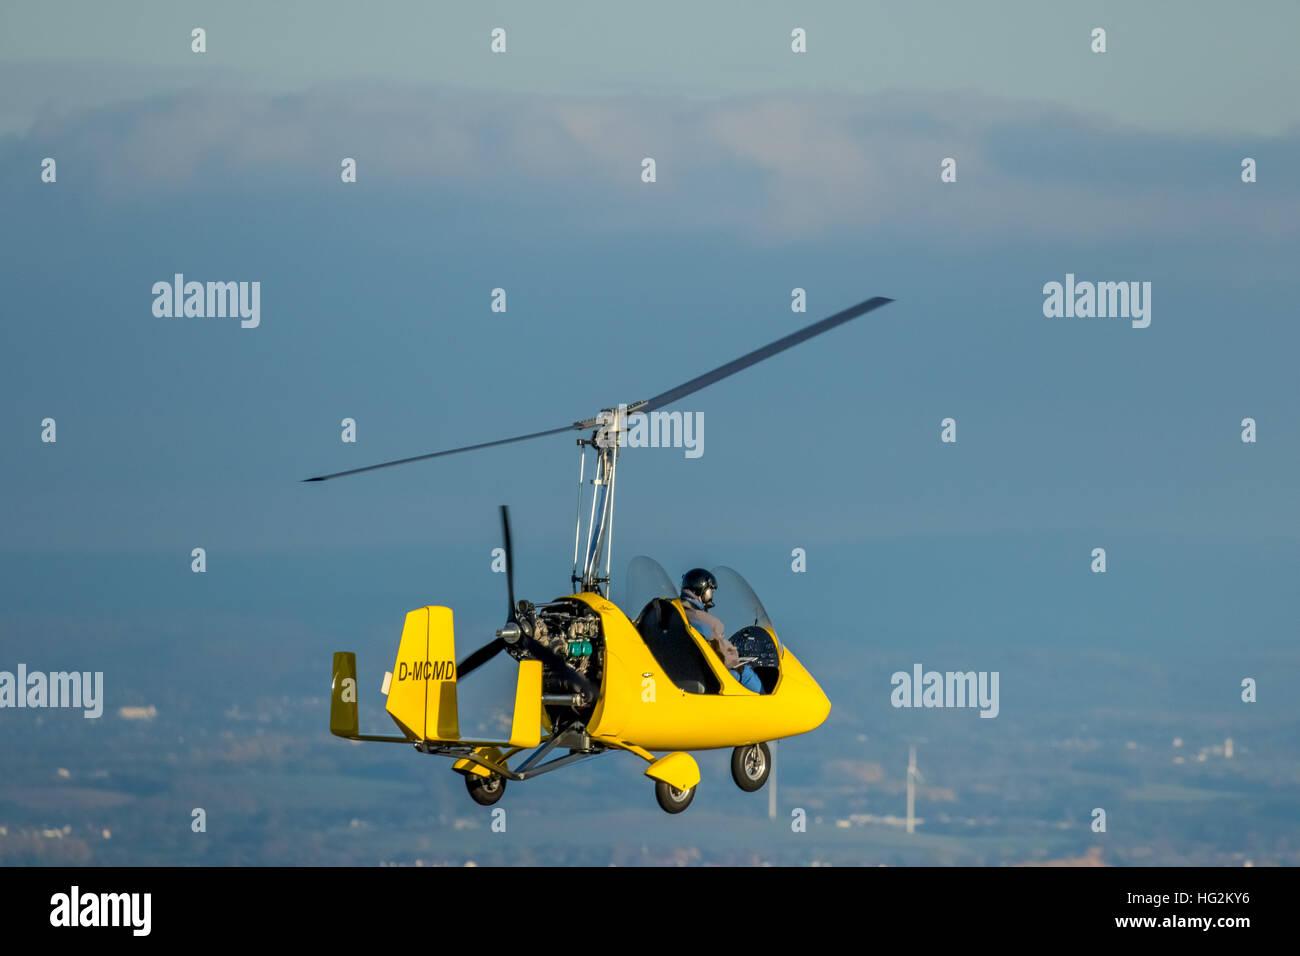 Vista aerea, Girocottero su Witten, D-MCMD, Ultra Leichhardt aeromobili, attrezzature sportive, volare, Witten, Immagini Stock